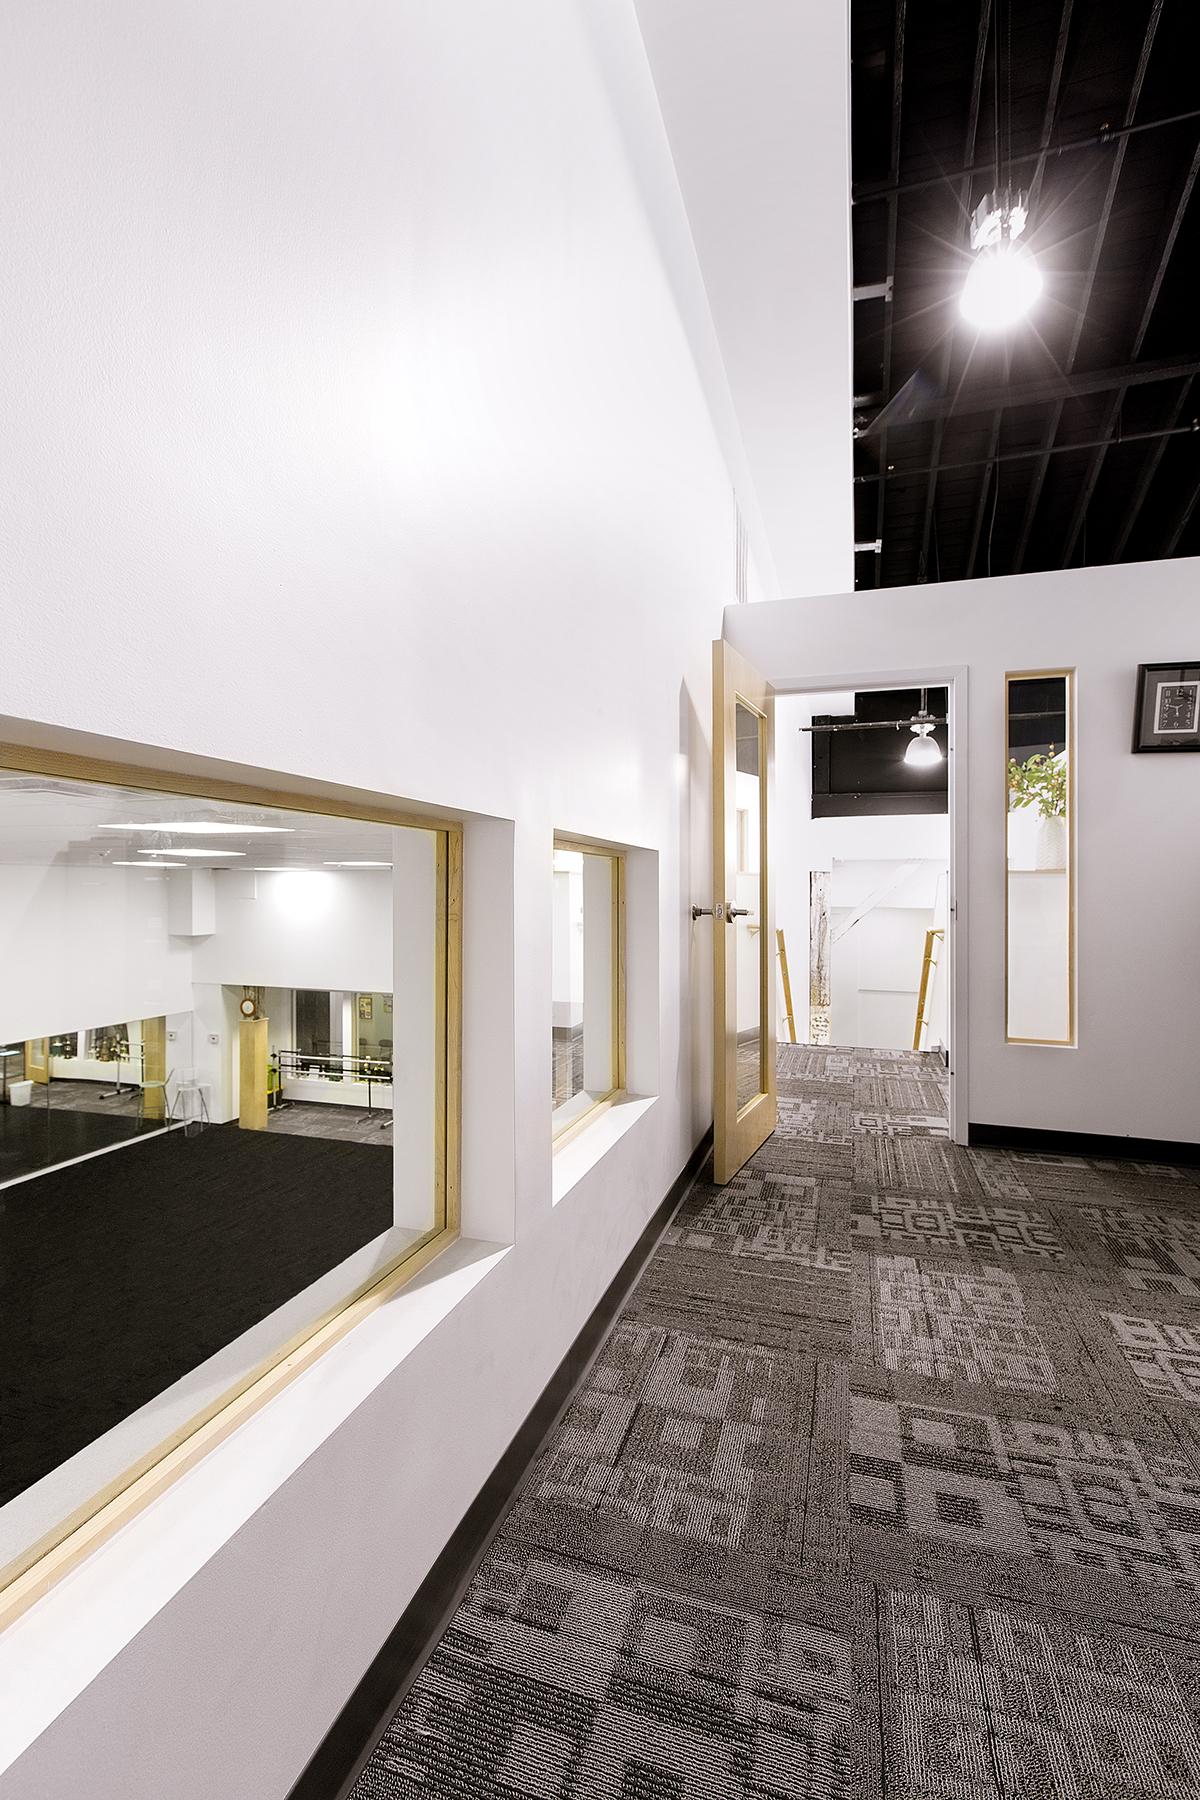 Tricia-Kendall-Architecture-0002